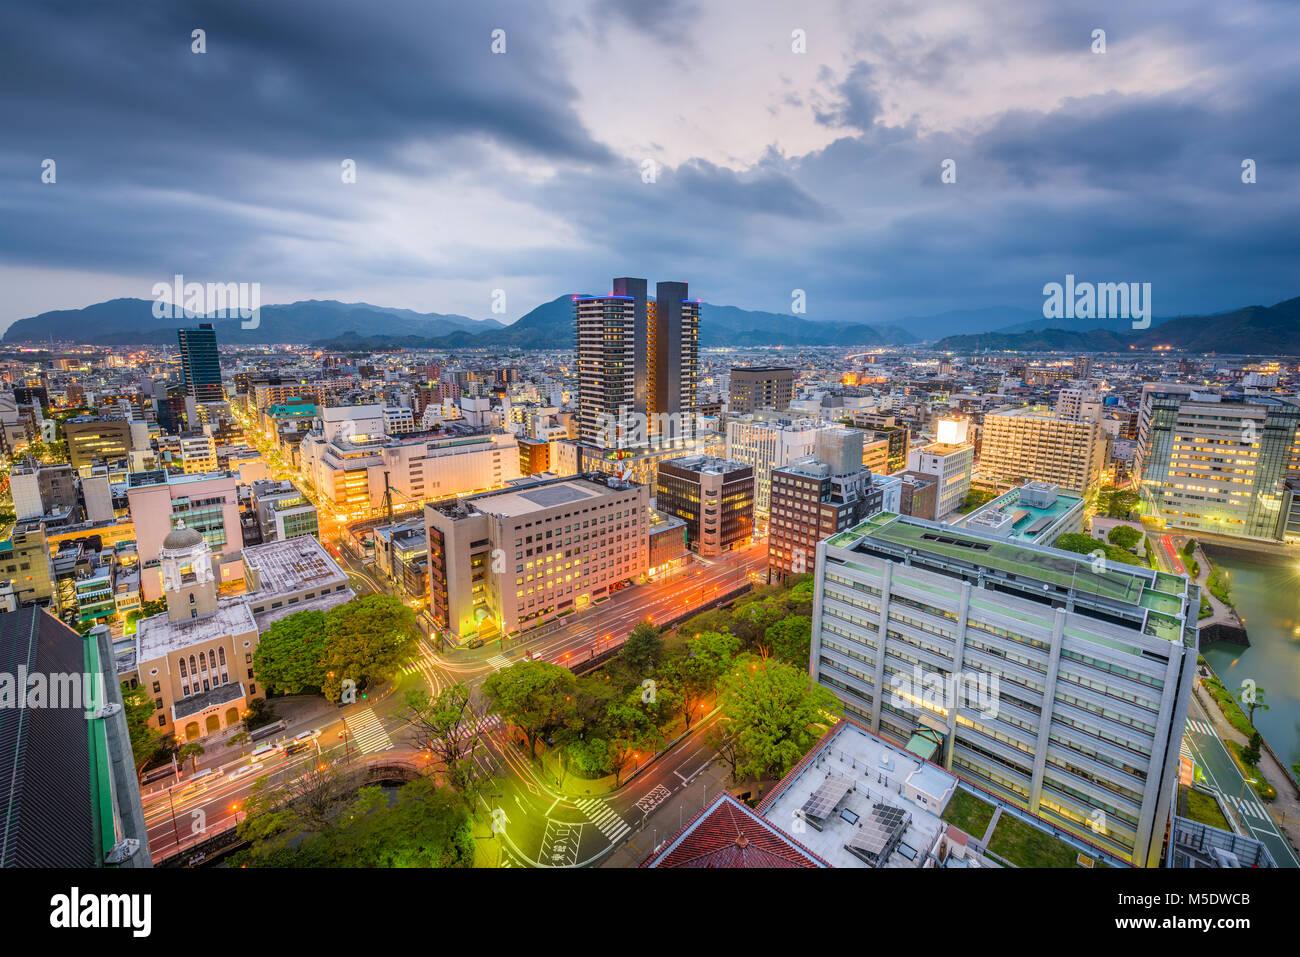 Shizuoka City, Japan downtown skyline at dusk. - Stock Image